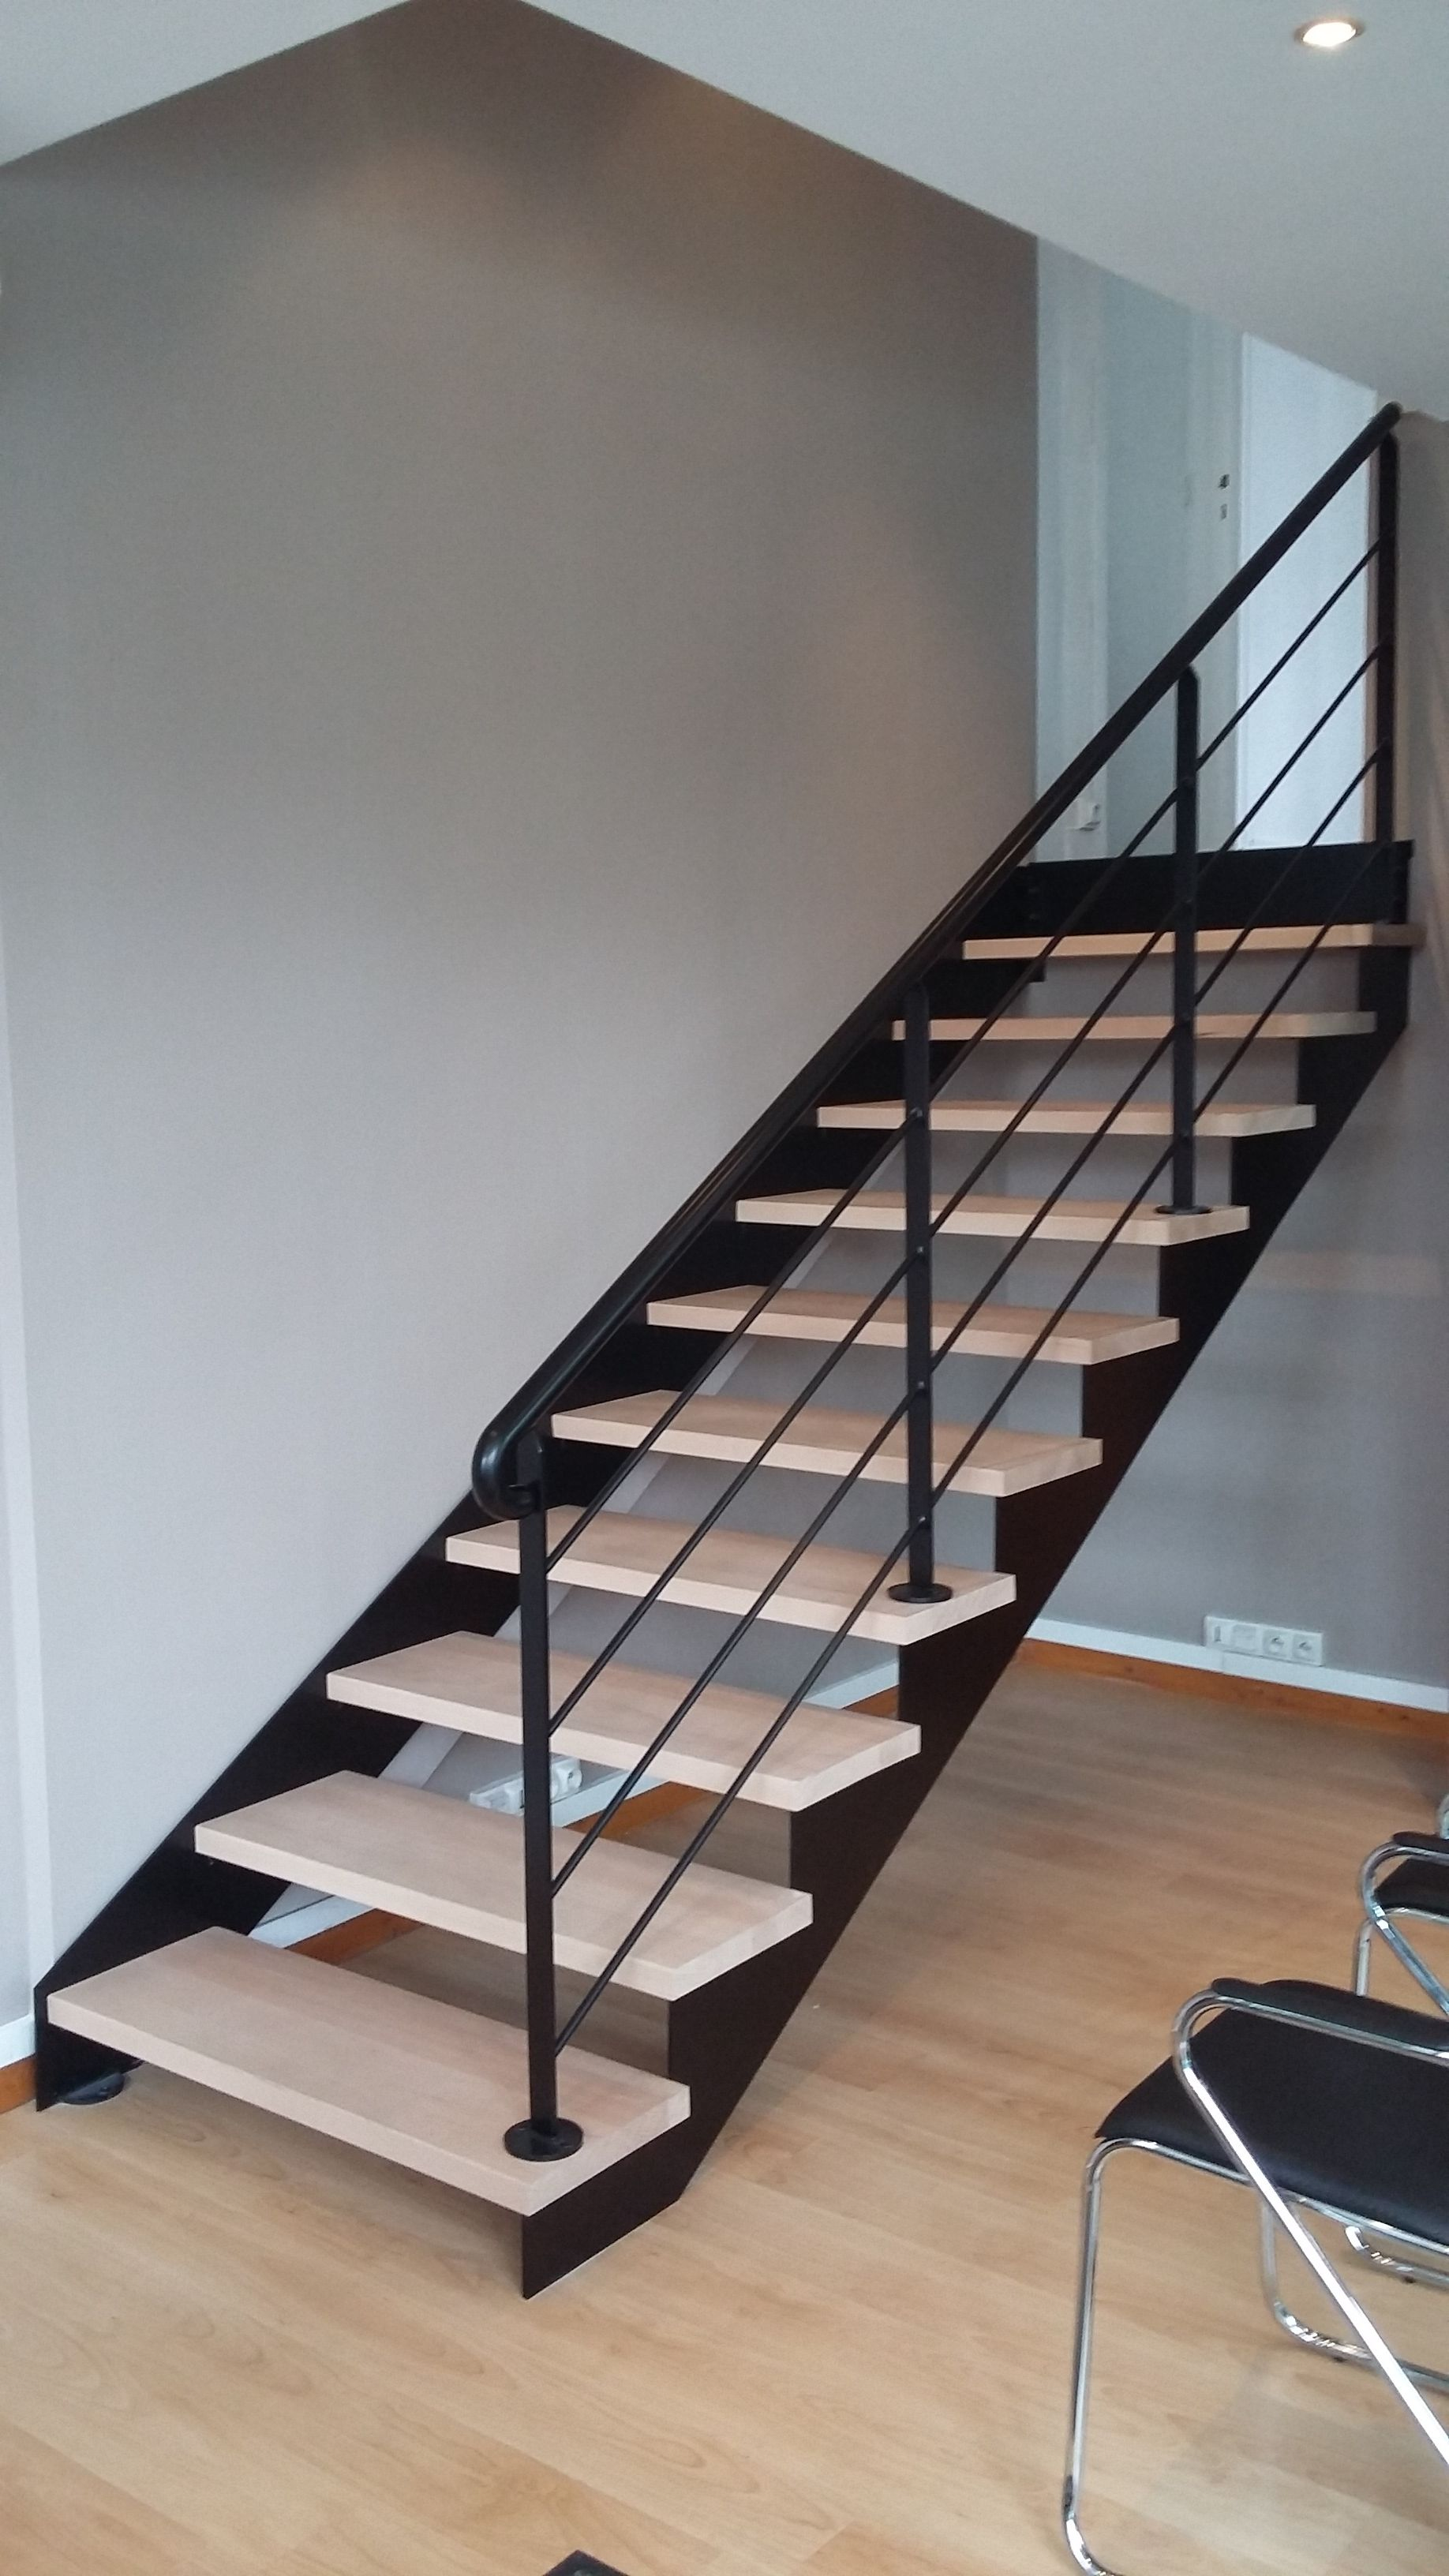 nos verri res escalier design 14 escalier limon fer. Black Bedroom Furniture Sets. Home Design Ideas